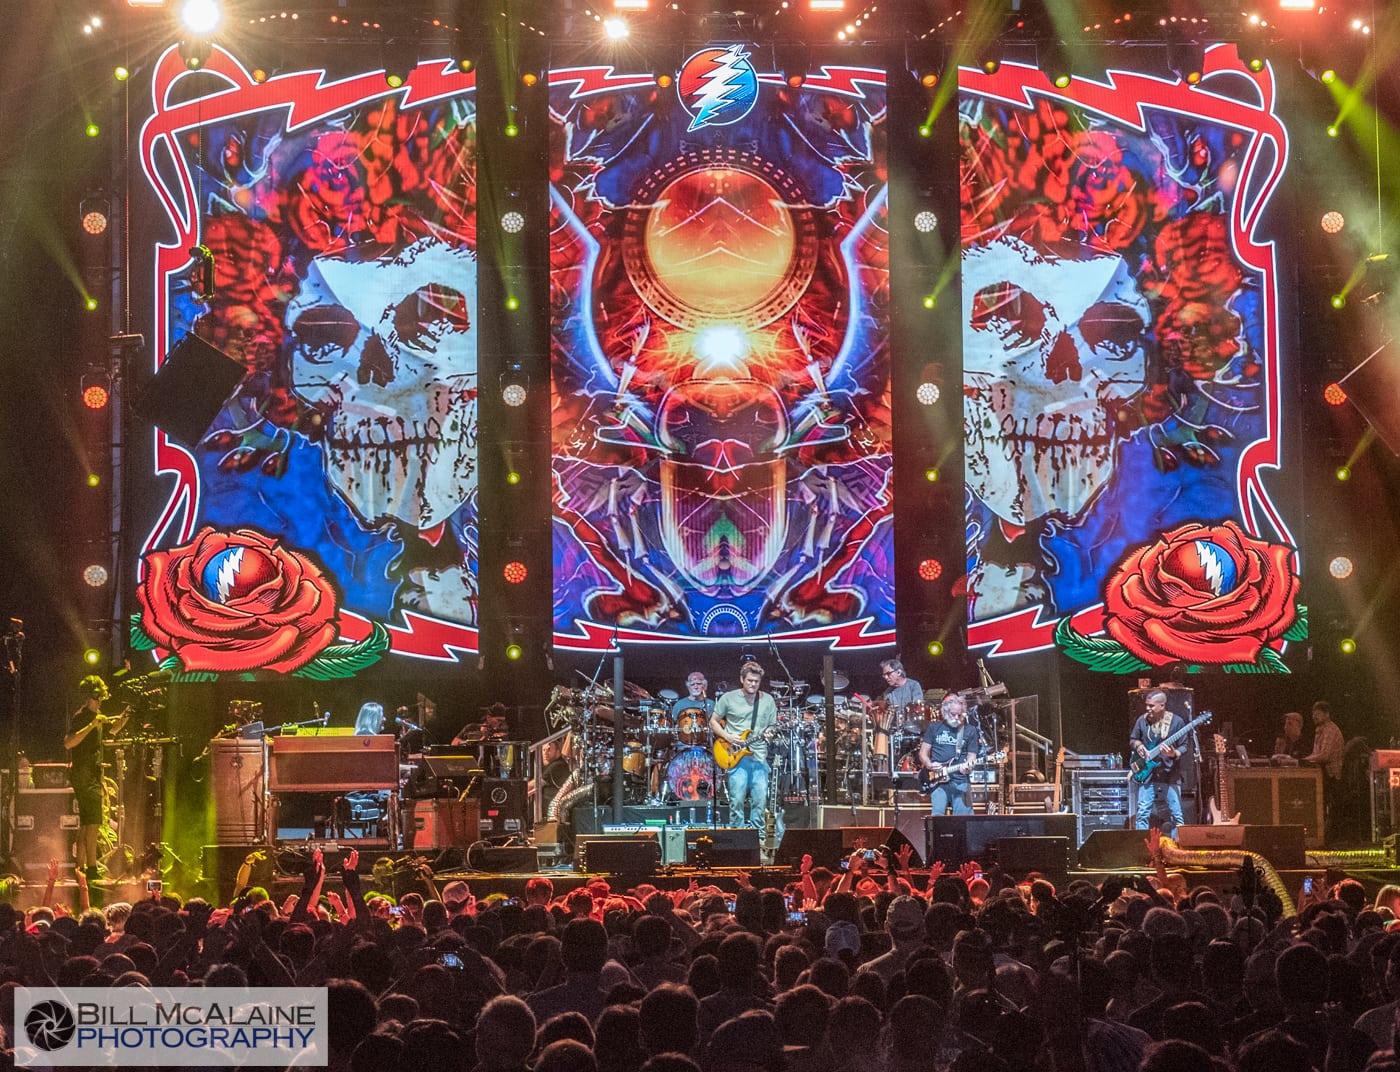 Dead & Company 2019 Summer Tour Debuts: Possibilities & Prognostication